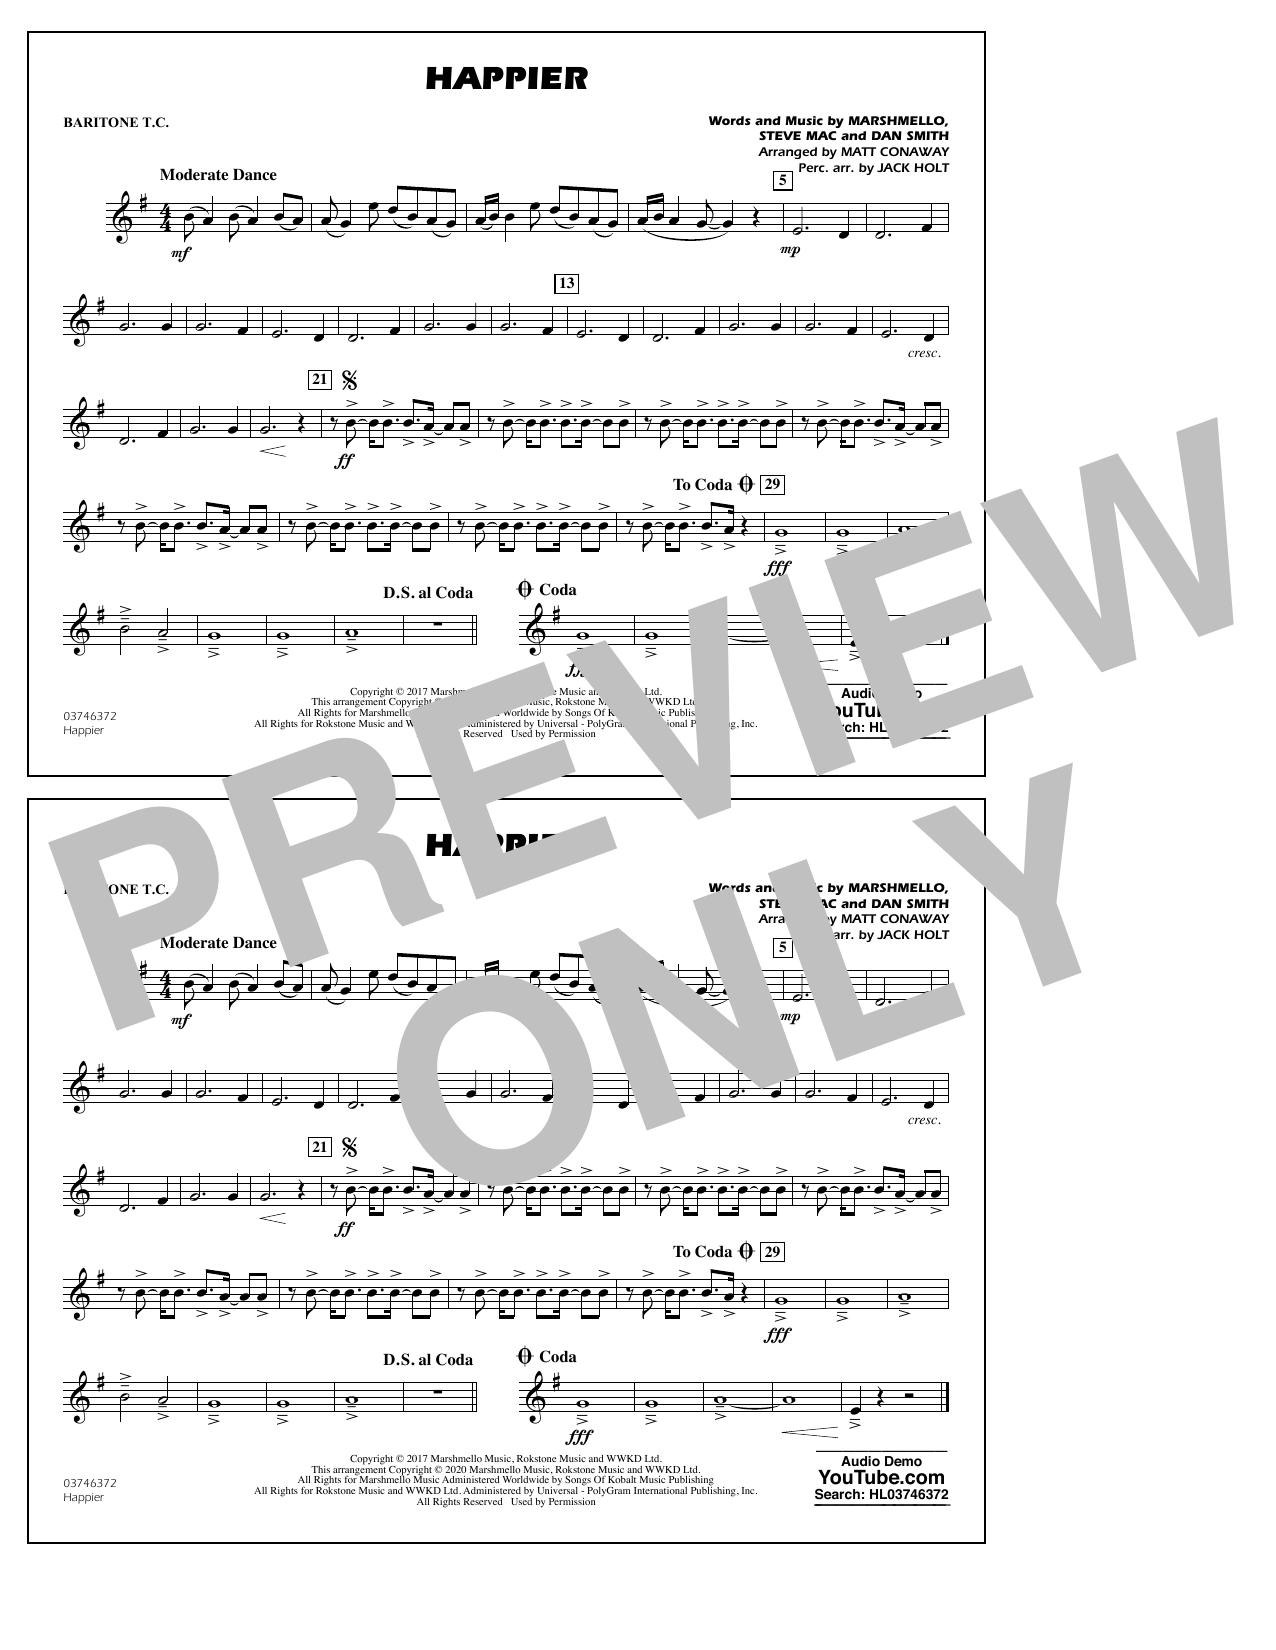 Happier (arr. Matt Conaway and Jack Holt) - Baritone T.C. Sheet Music